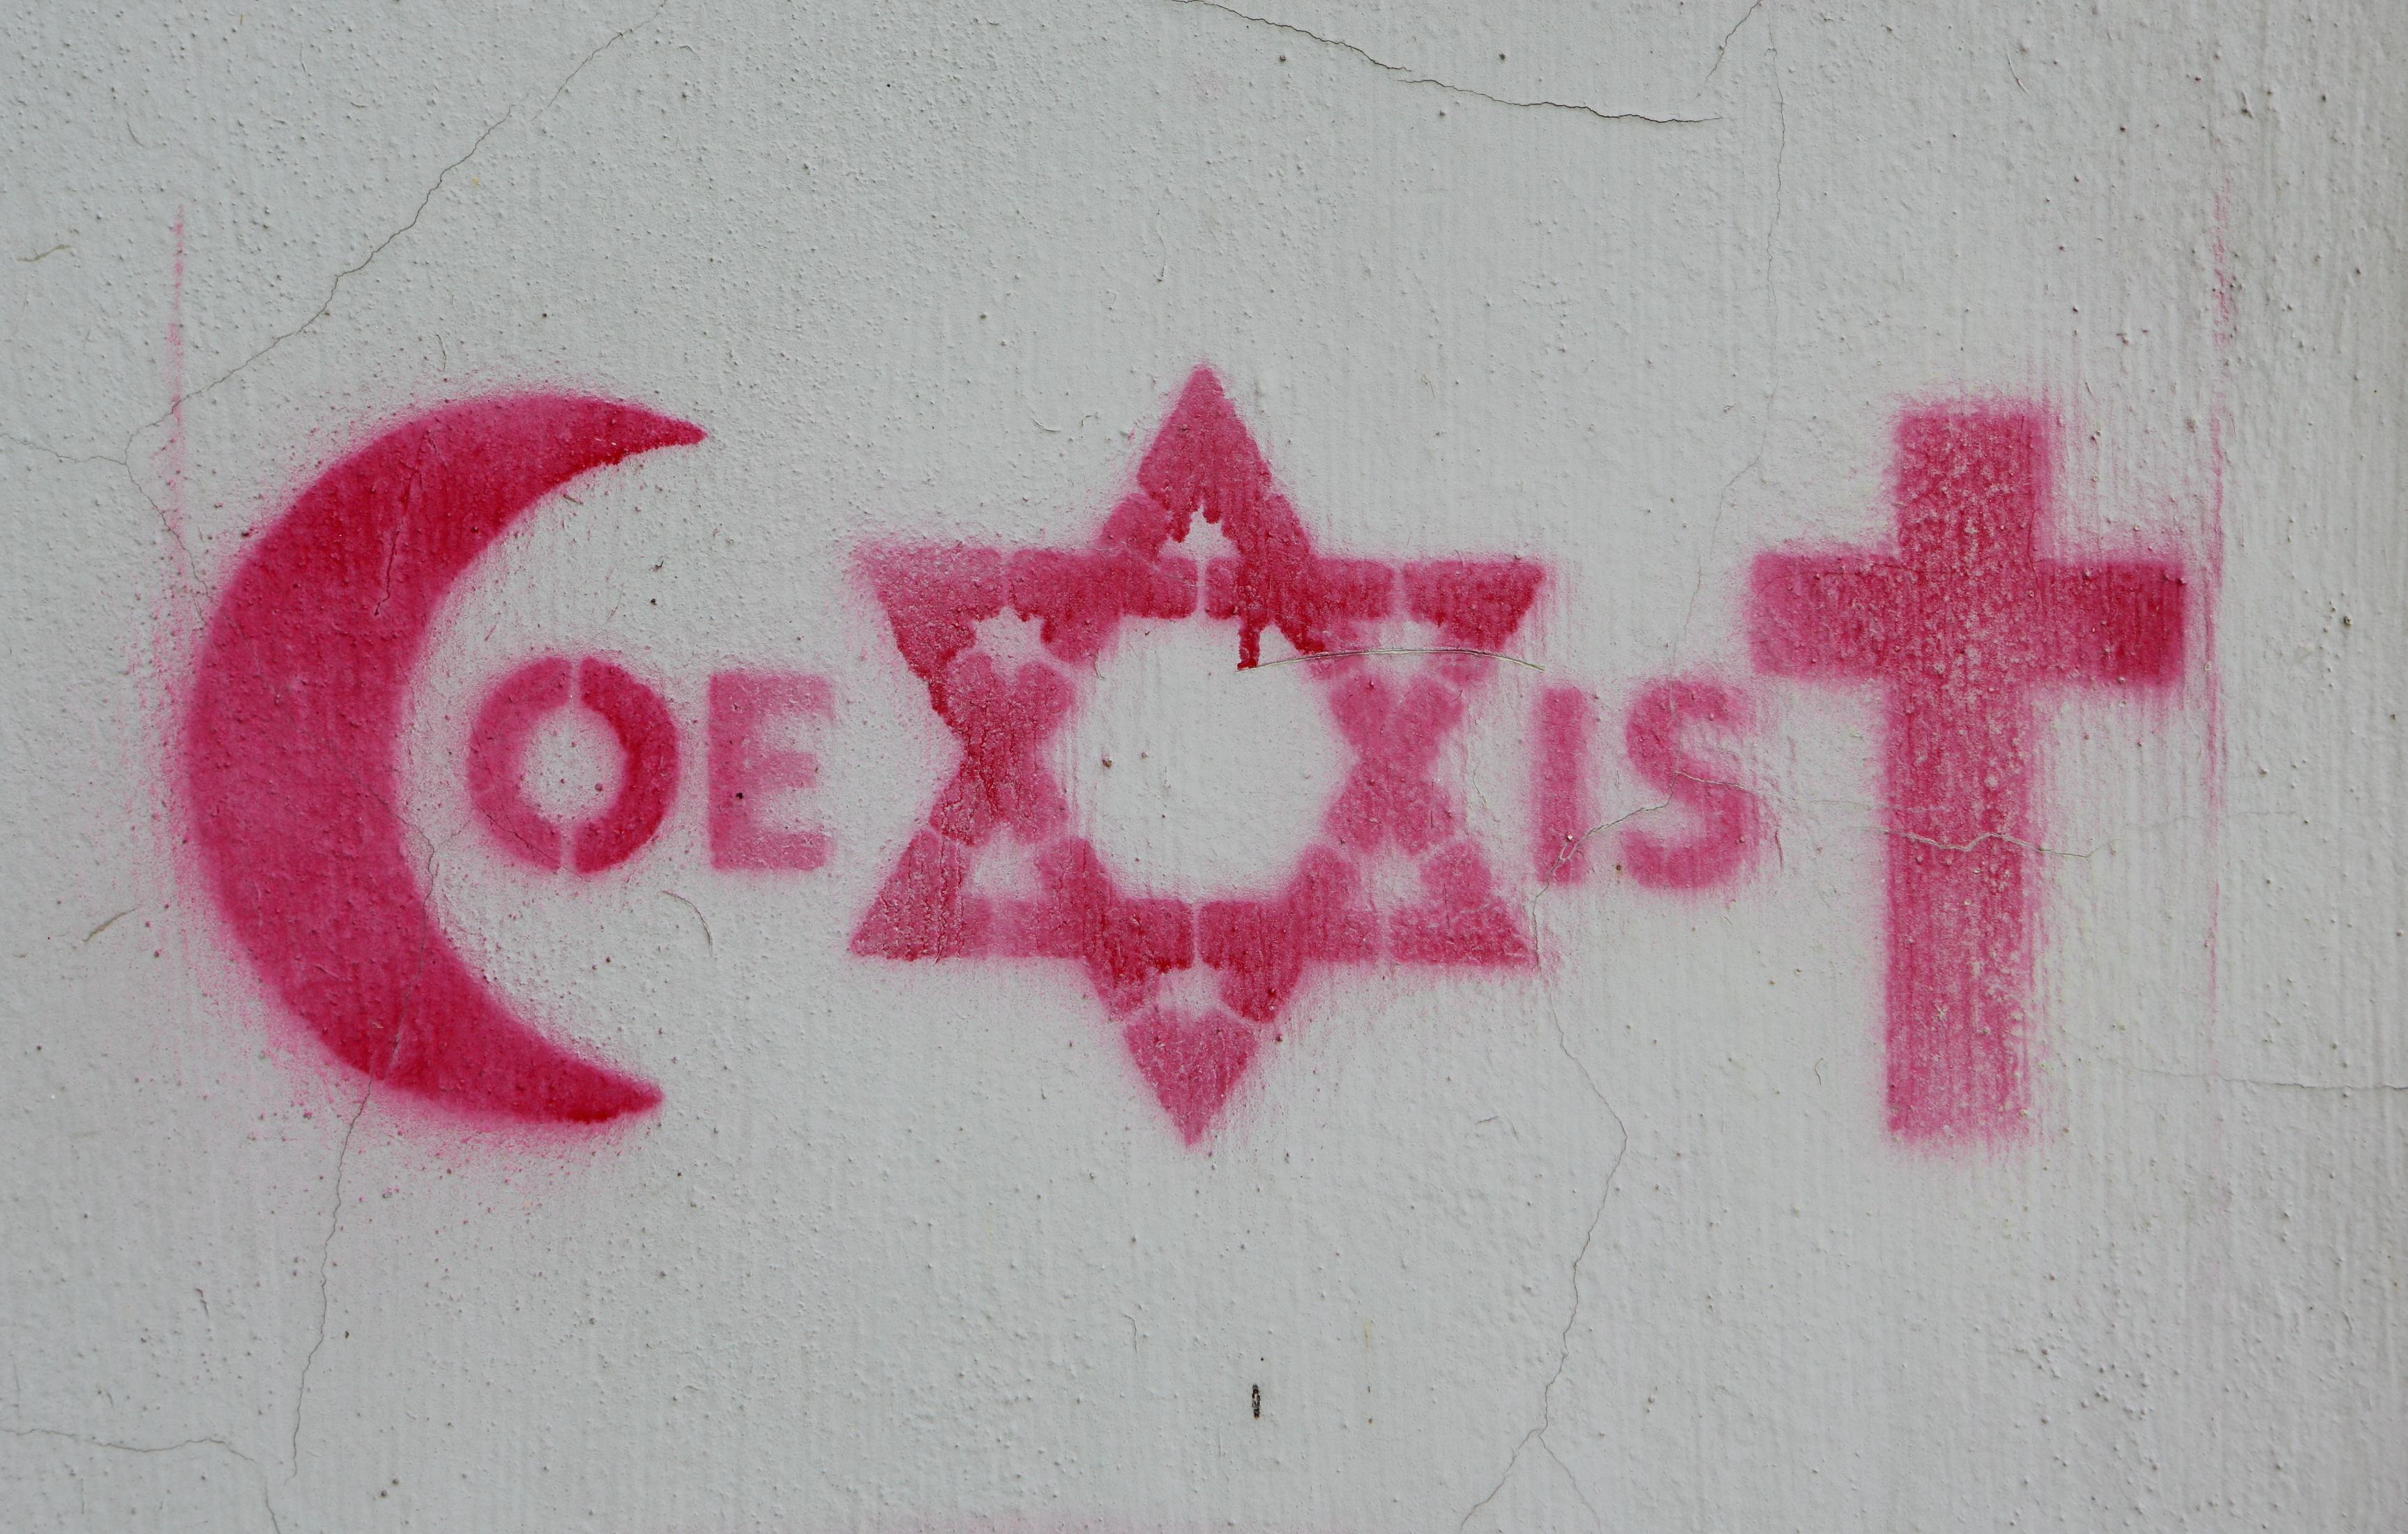 The big fight over coexist vox the coexist symbol in prague buycottarizona